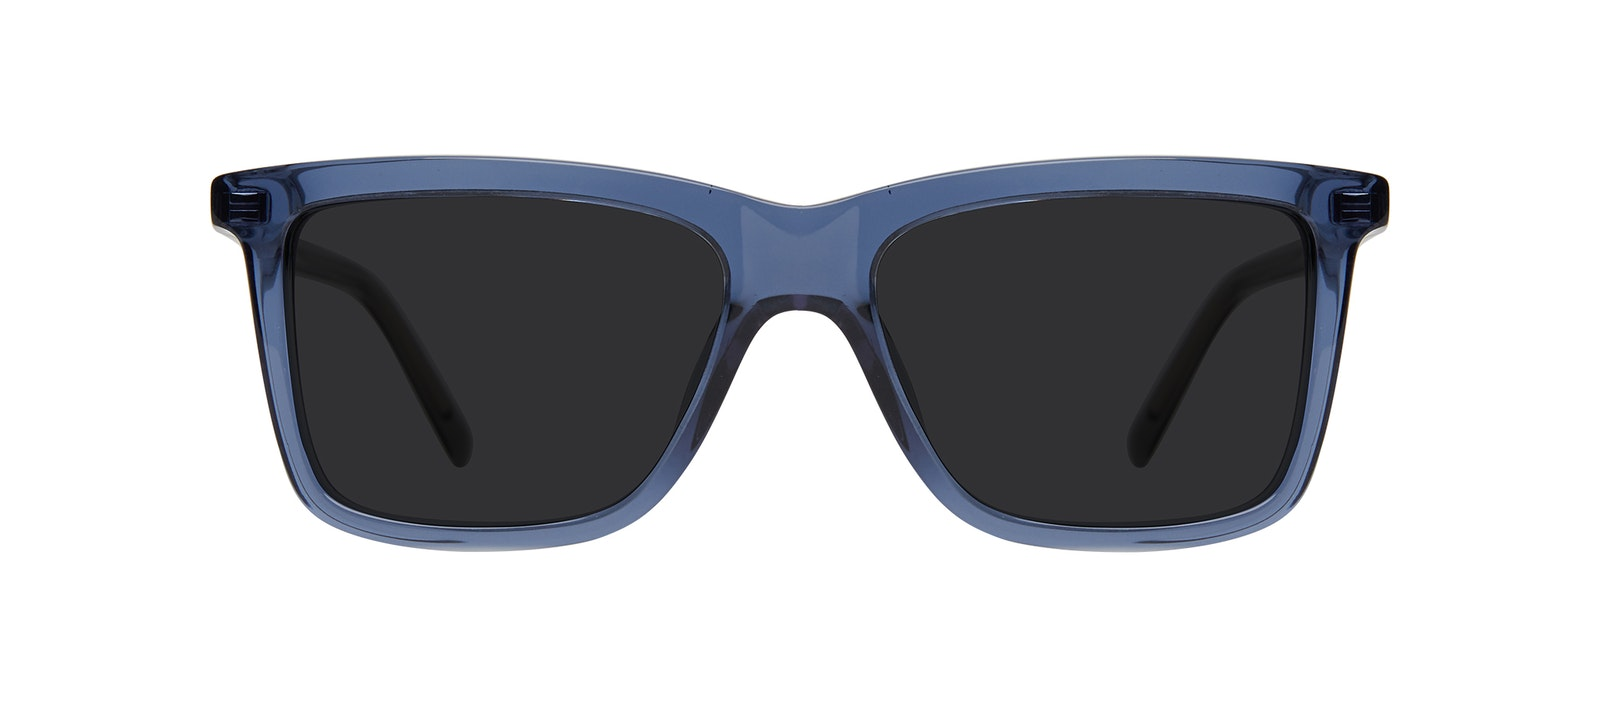 Affordable Fashion Glasses Square Sunglasses Kids Elite Junior Oxford Blue Front